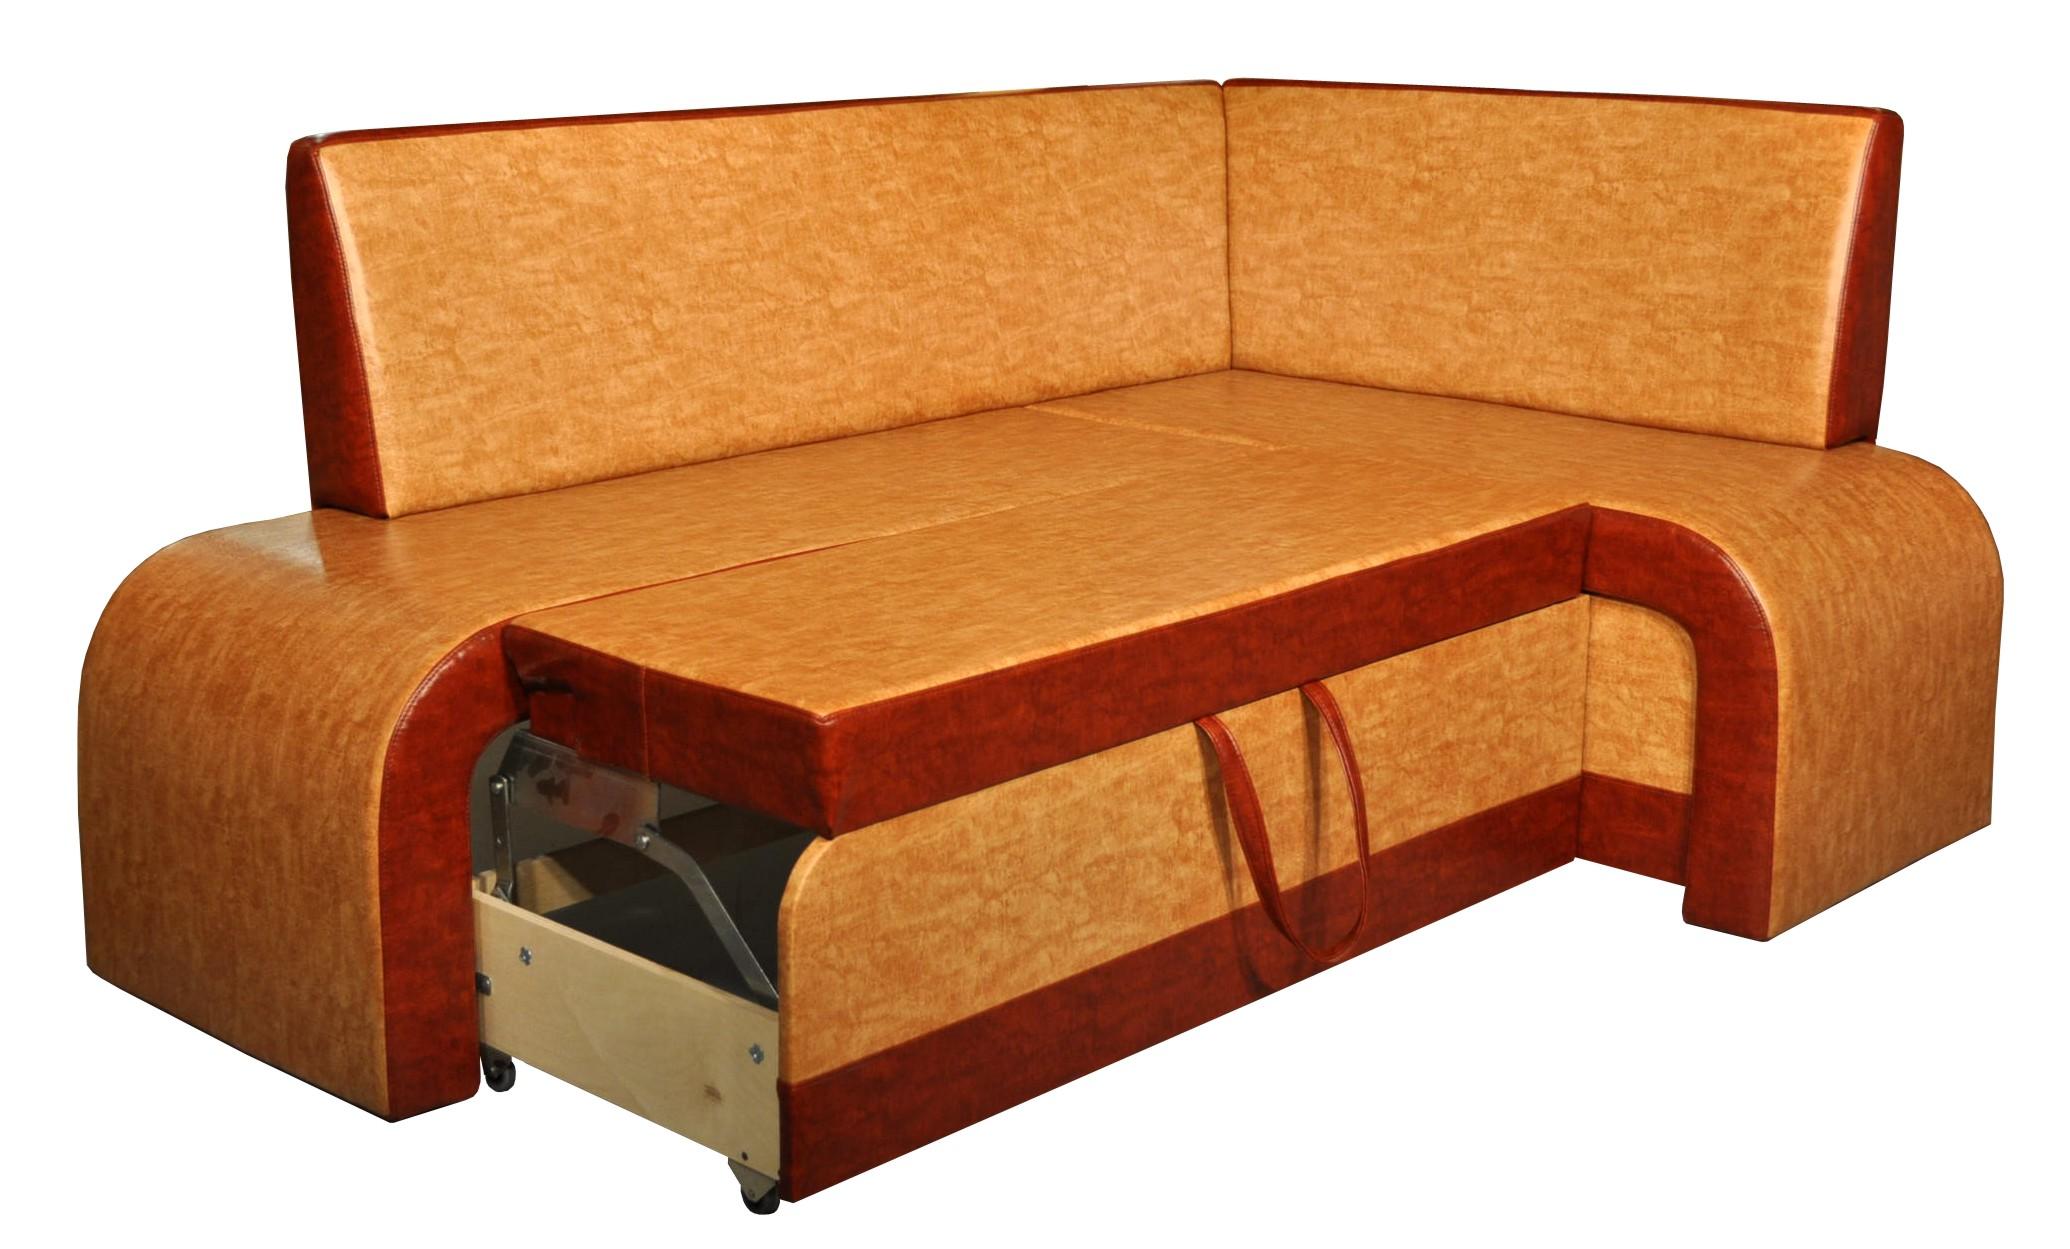 Разновидность дивана